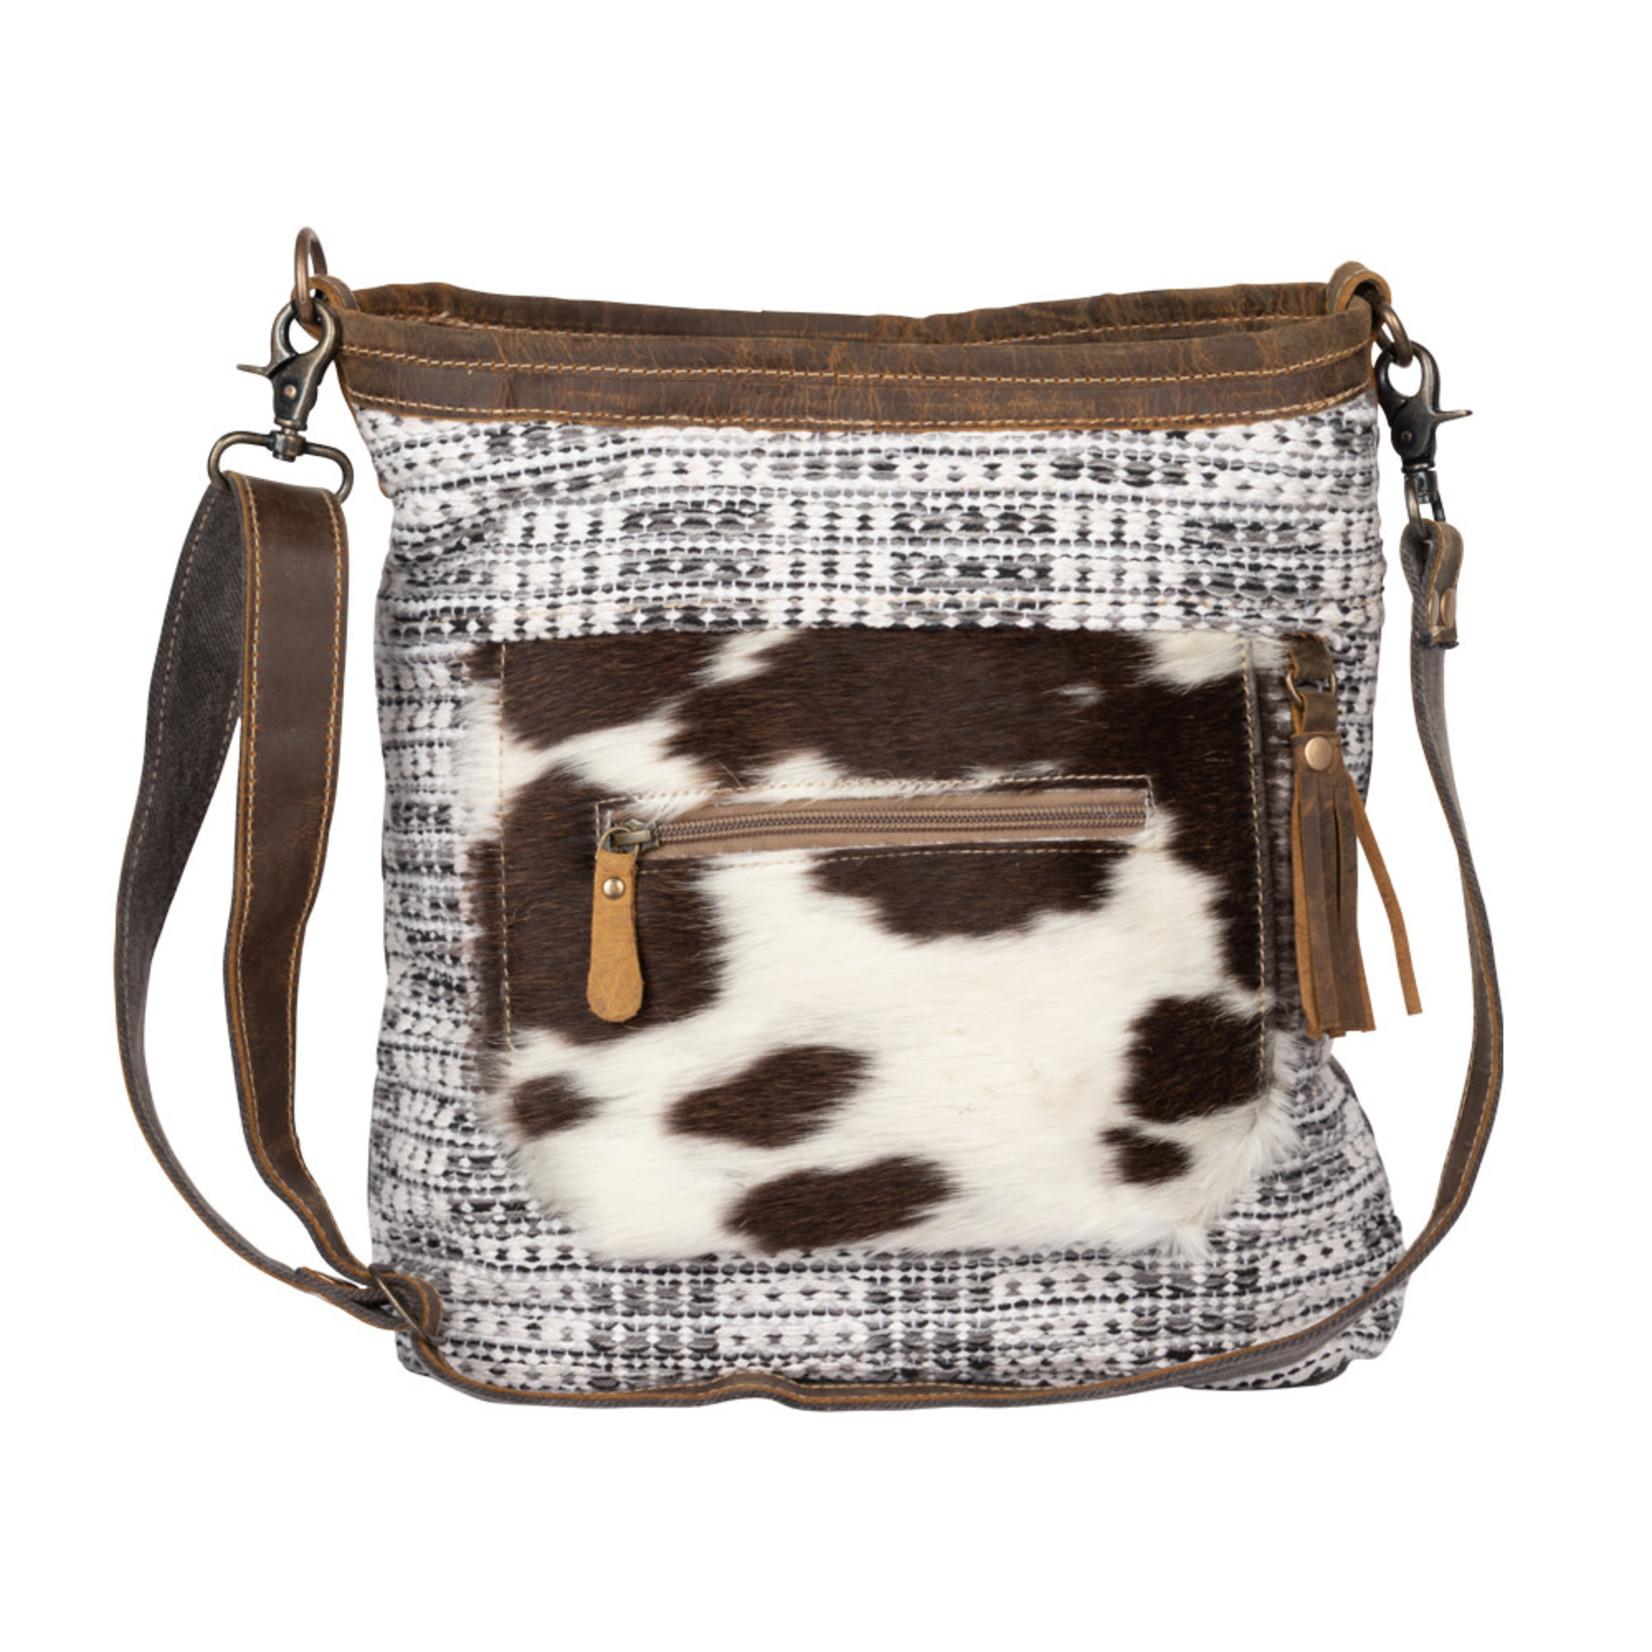 Myra Bags S-2238 Fancy Lullaby Shoulder Bag